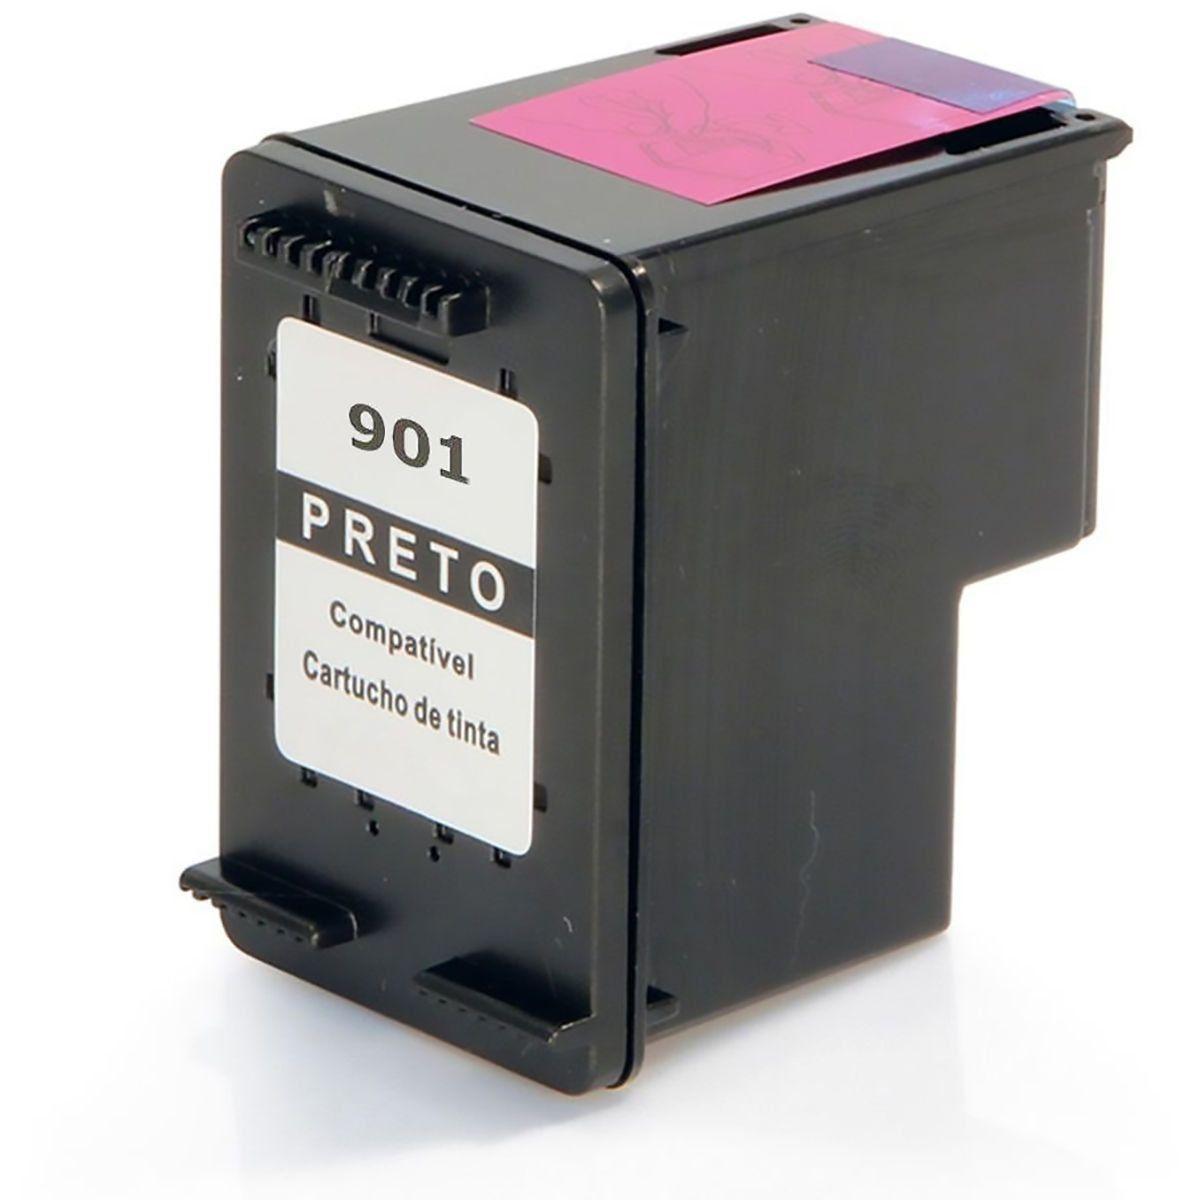 Compatível: Cartucho de Tinta 901 para HP J4540 J4550 J4580 J4680 J4660 J4500 J-4540 J-4550 J-4580 / Preto / 13ml